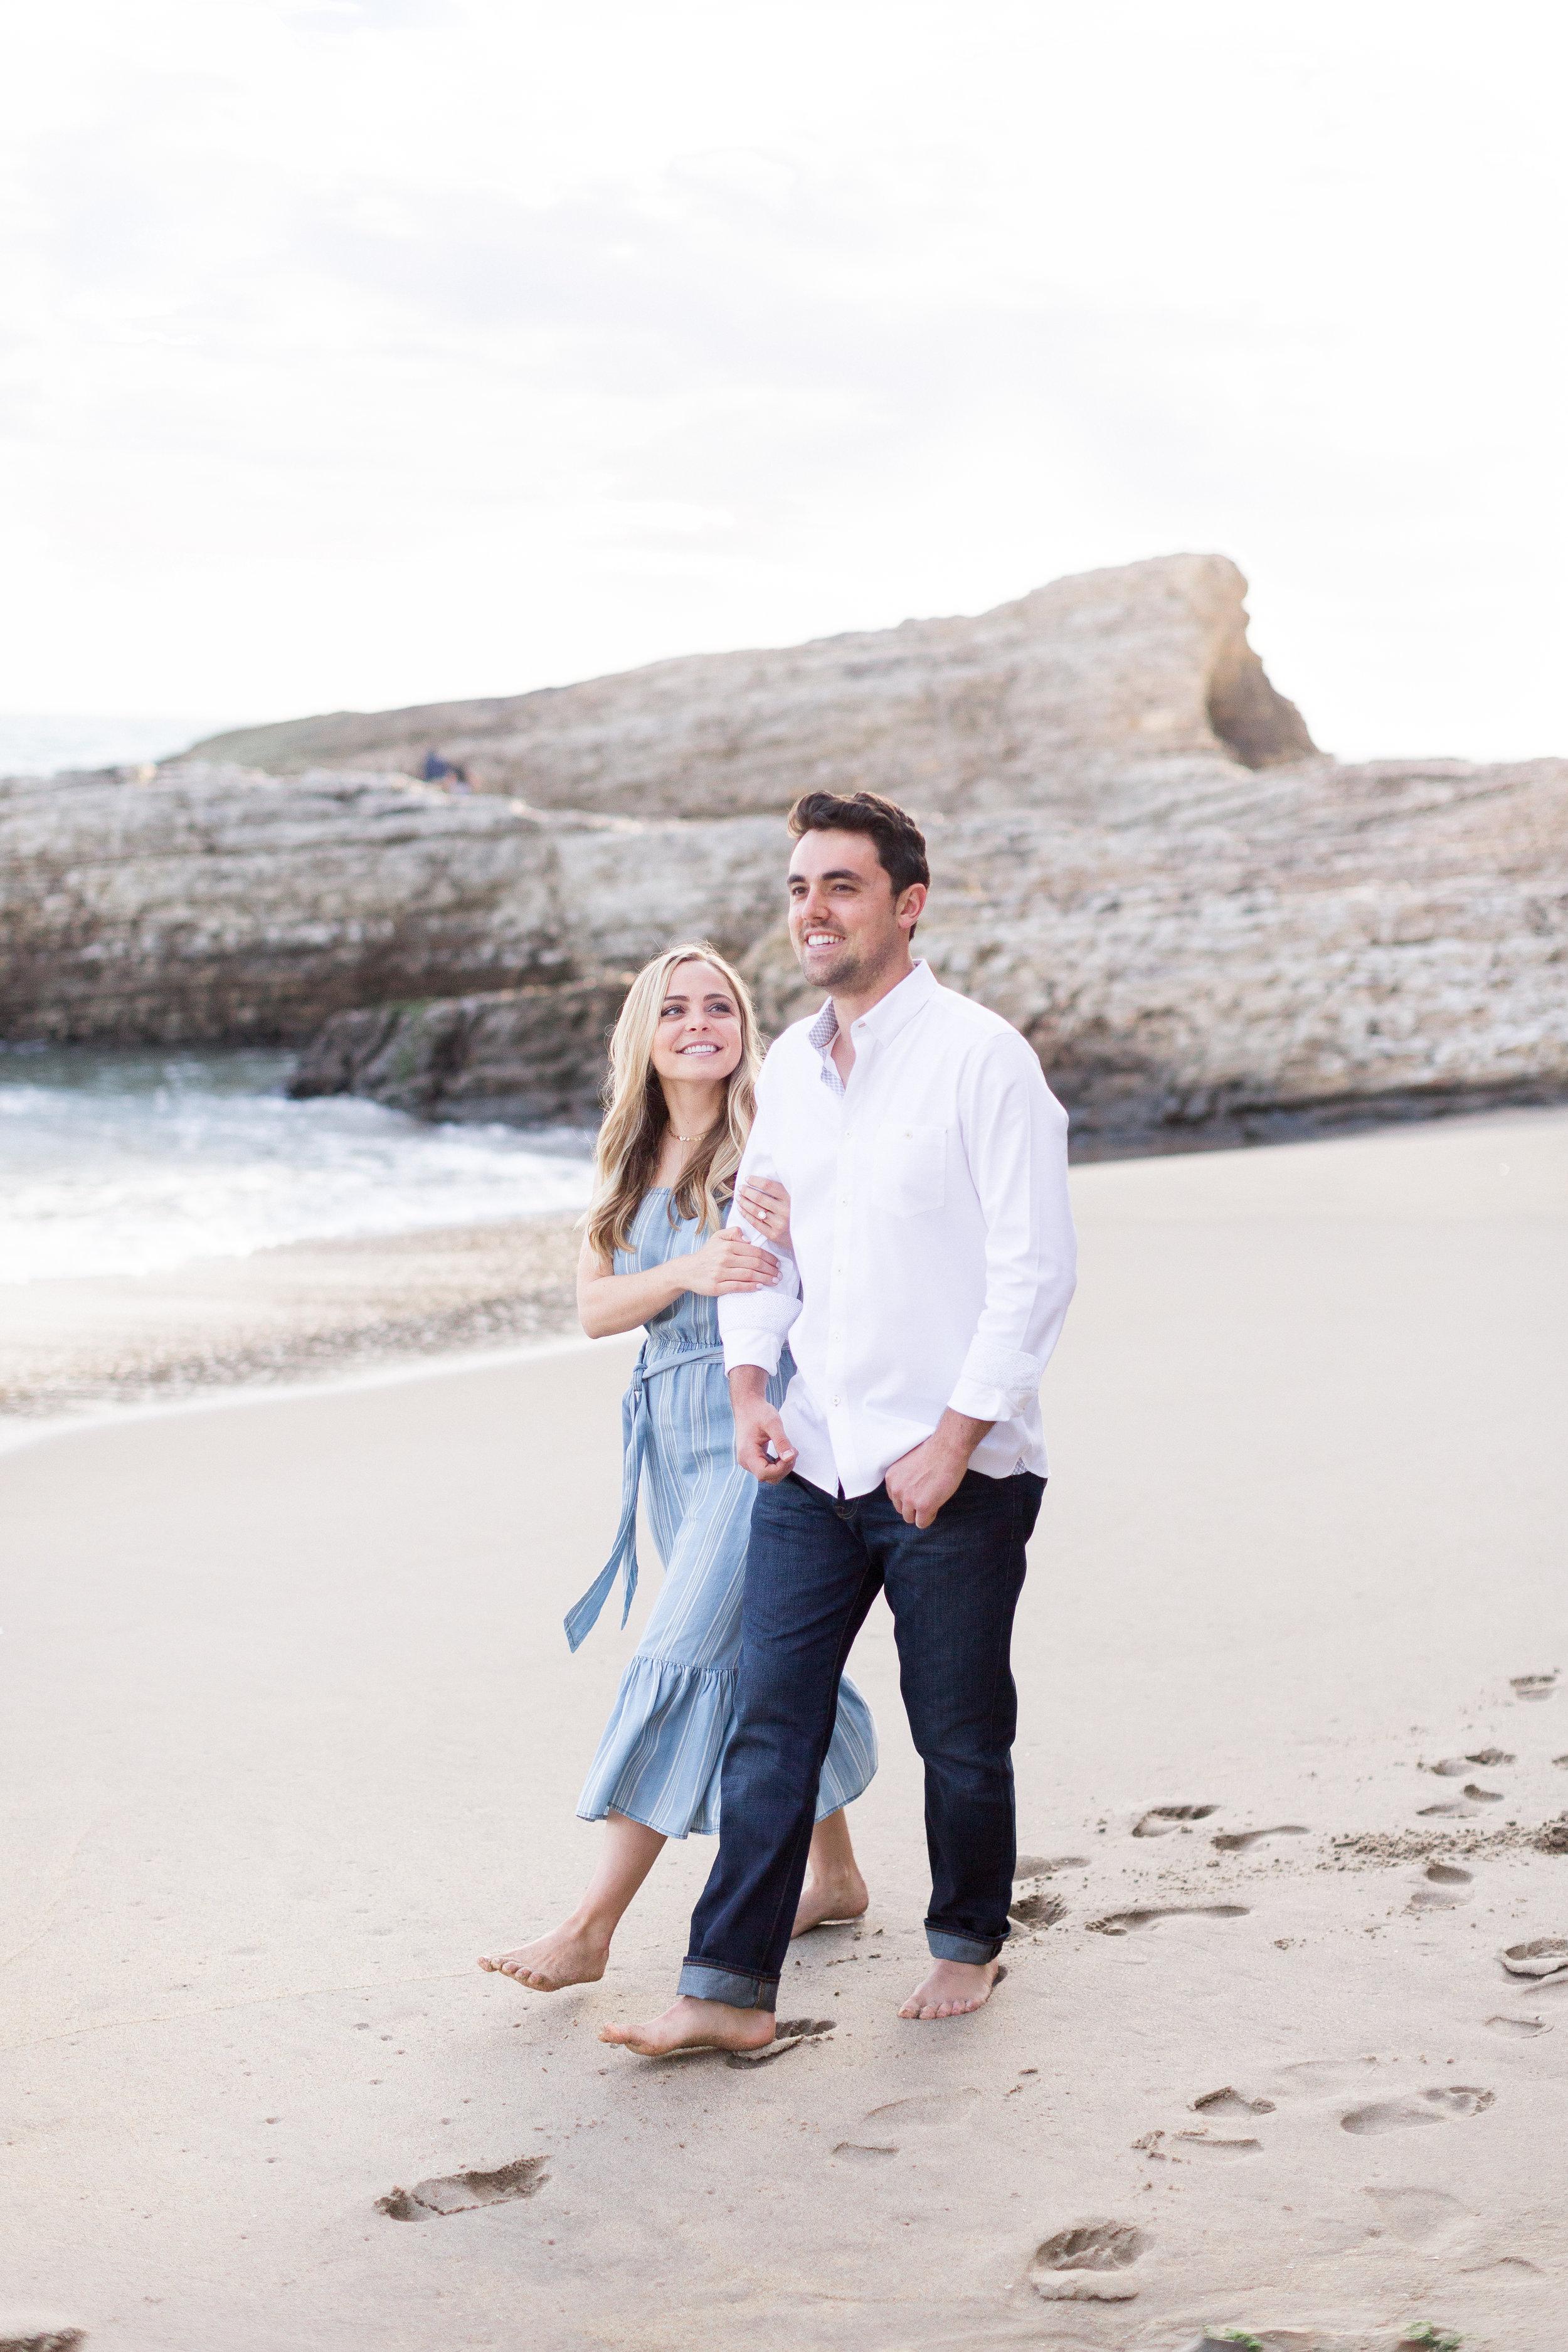 panther-beach-santa-cruz-engagement-session-photographer-45.jpg